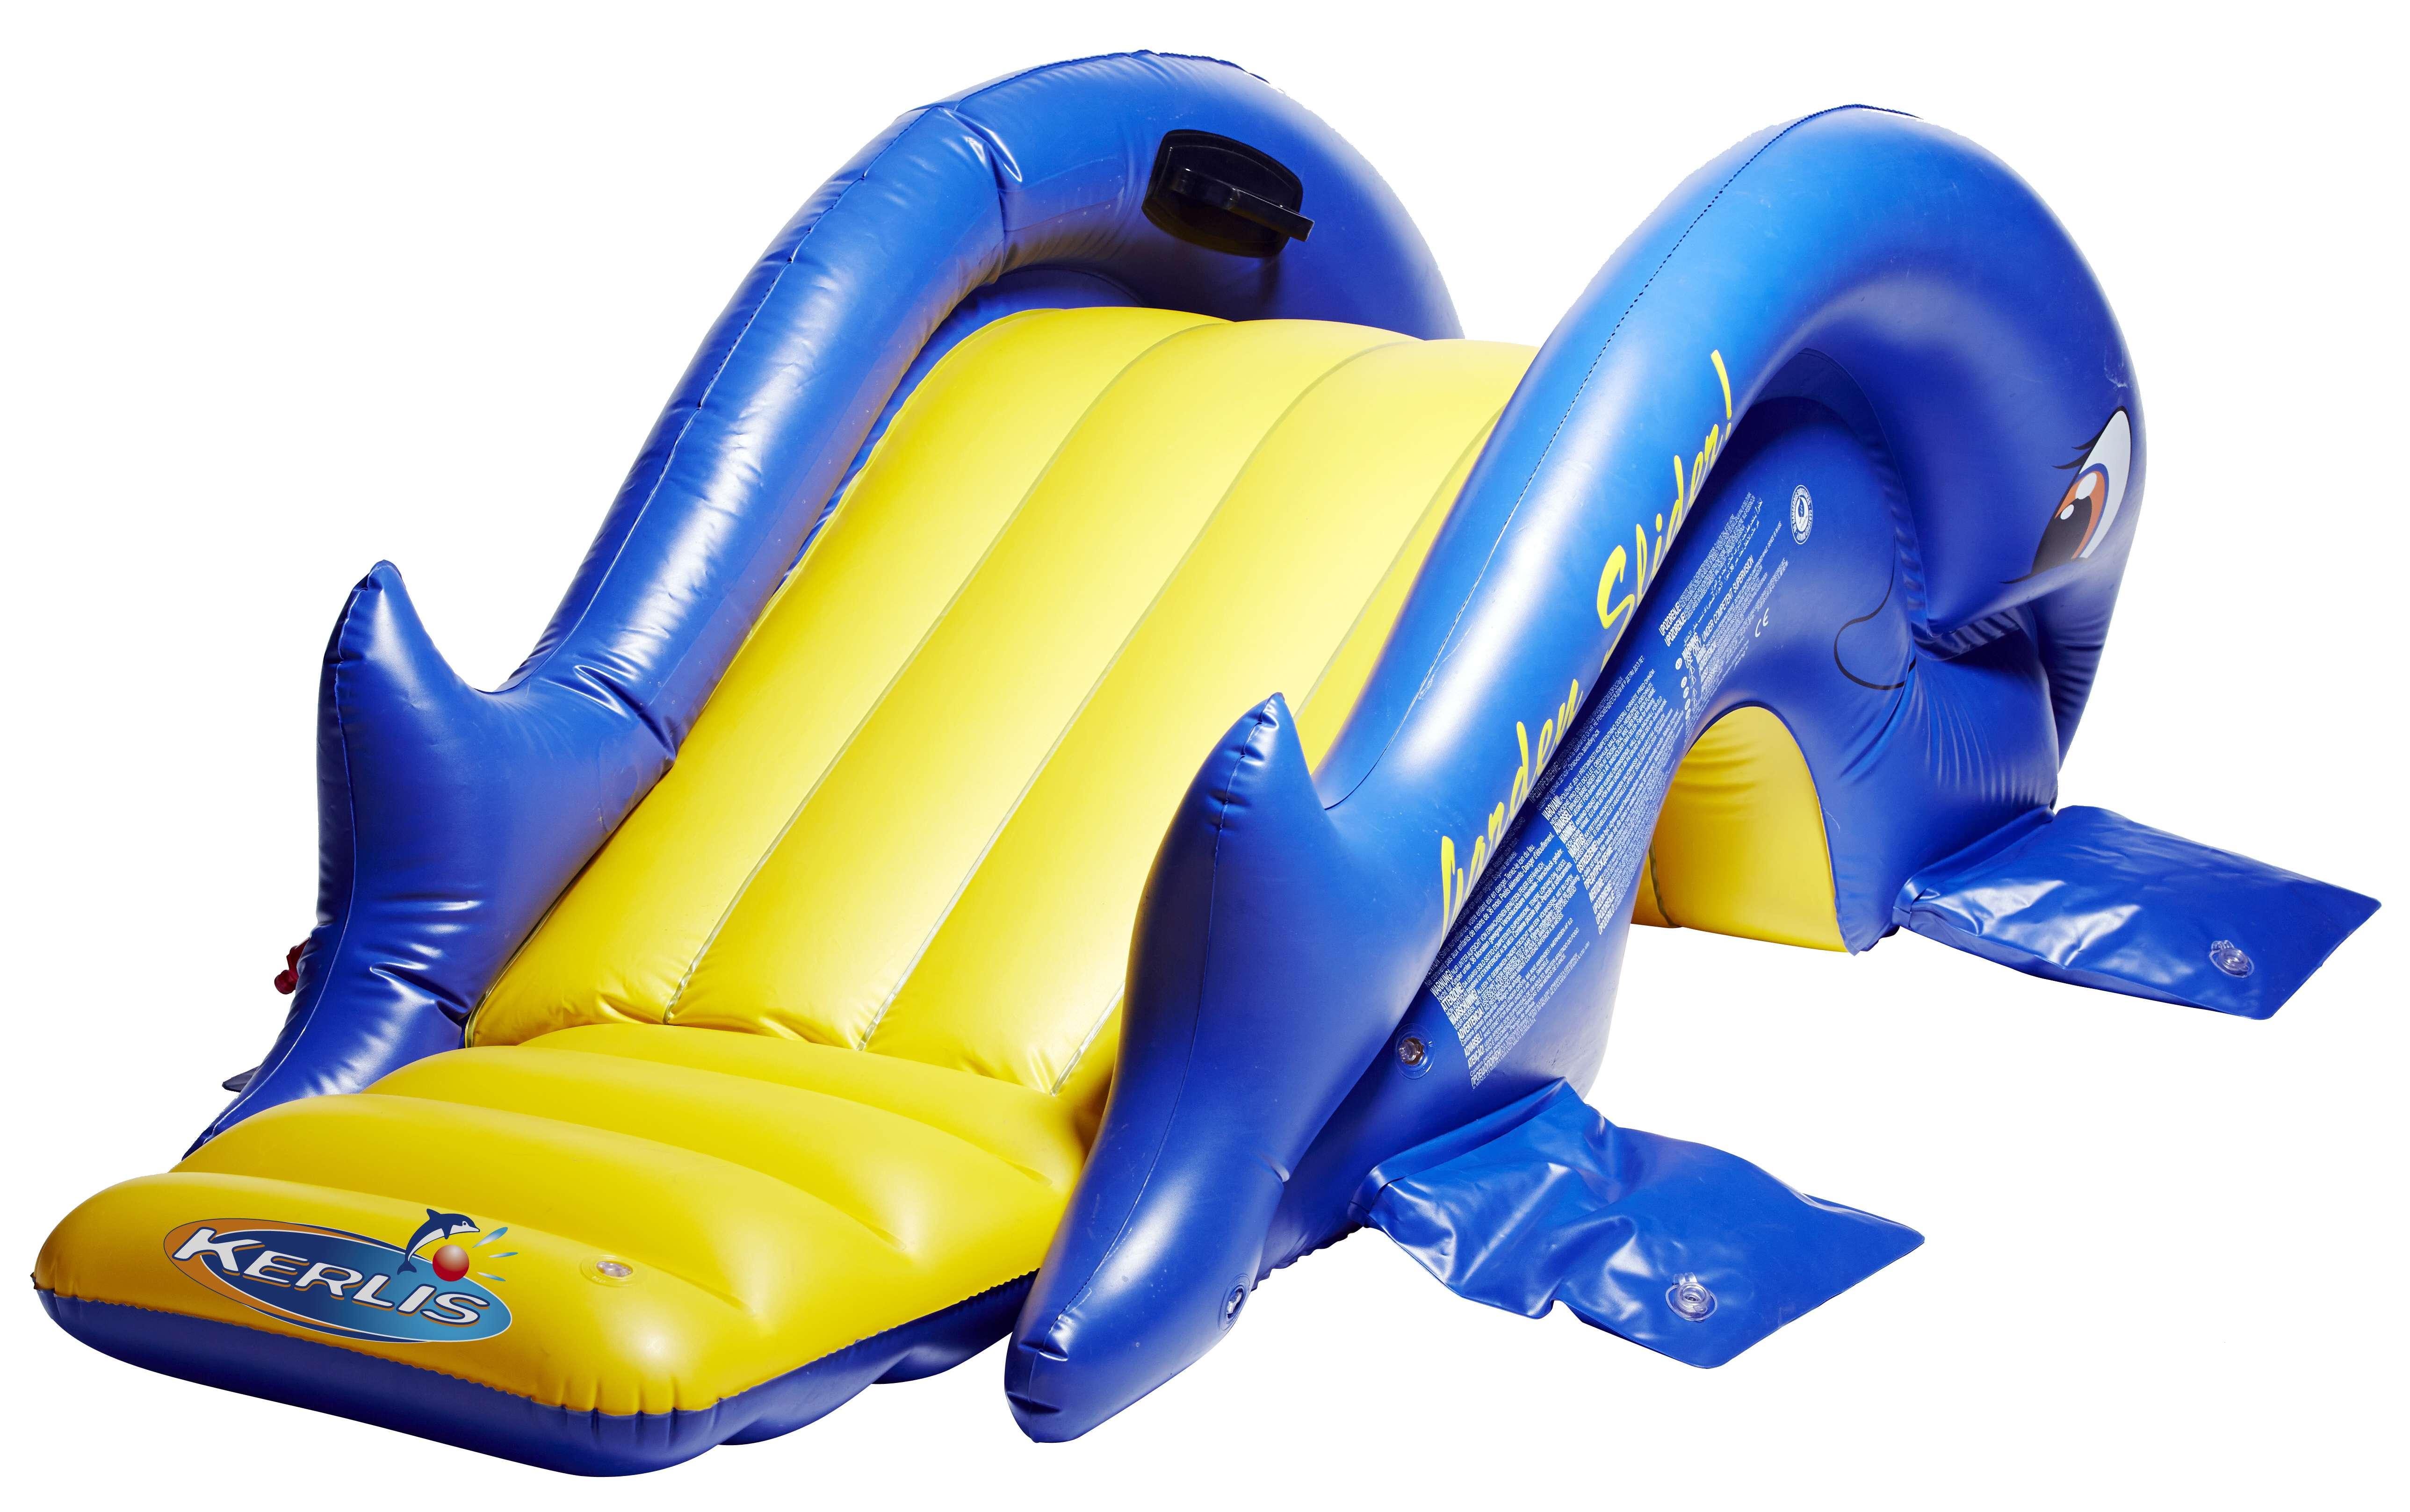 Scivolo gonfiabile toboggan balena 1000 piscine - Scivolo gonfiabile per piscina ...